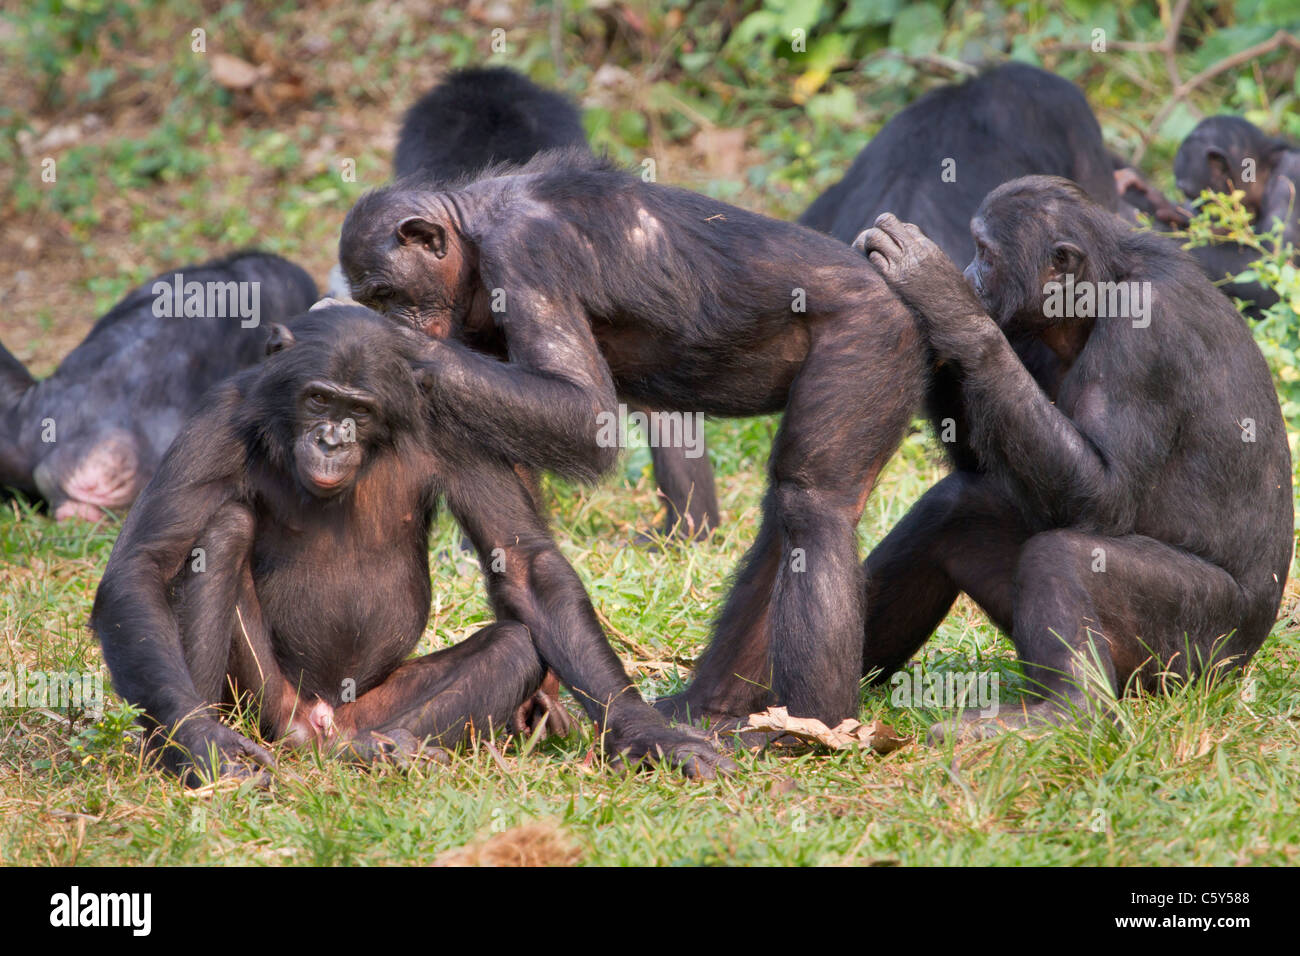 Bonobo (Pan paniscus) doing grooming, D.R. Congo. - Stock Image